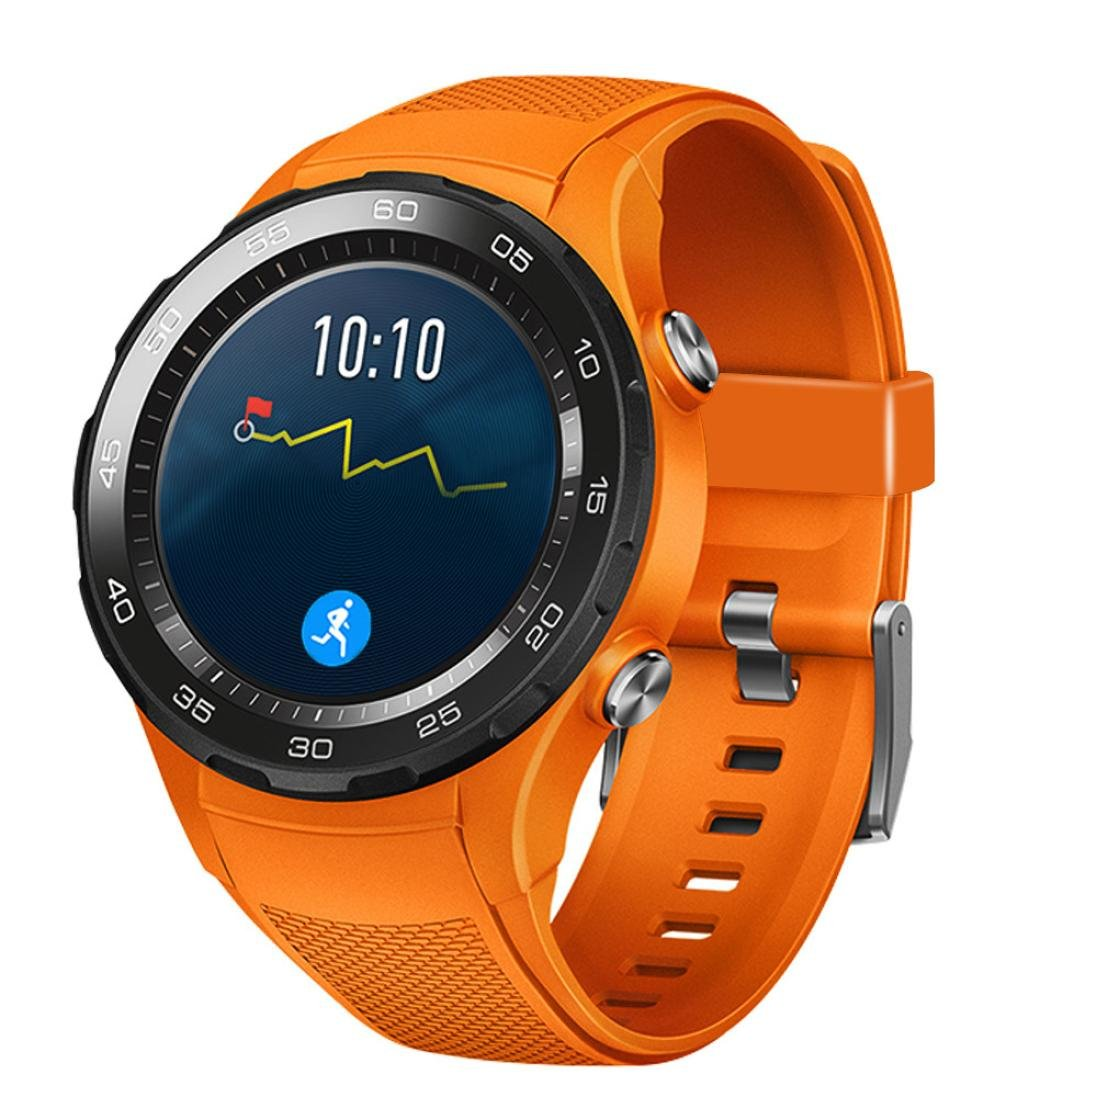 morrivoe Wtachバンド交換用アクセサリfor Huawei Watch 2、スポーツシリコンブレスレットストラップバンド  オレンジ B07BTJGVF9